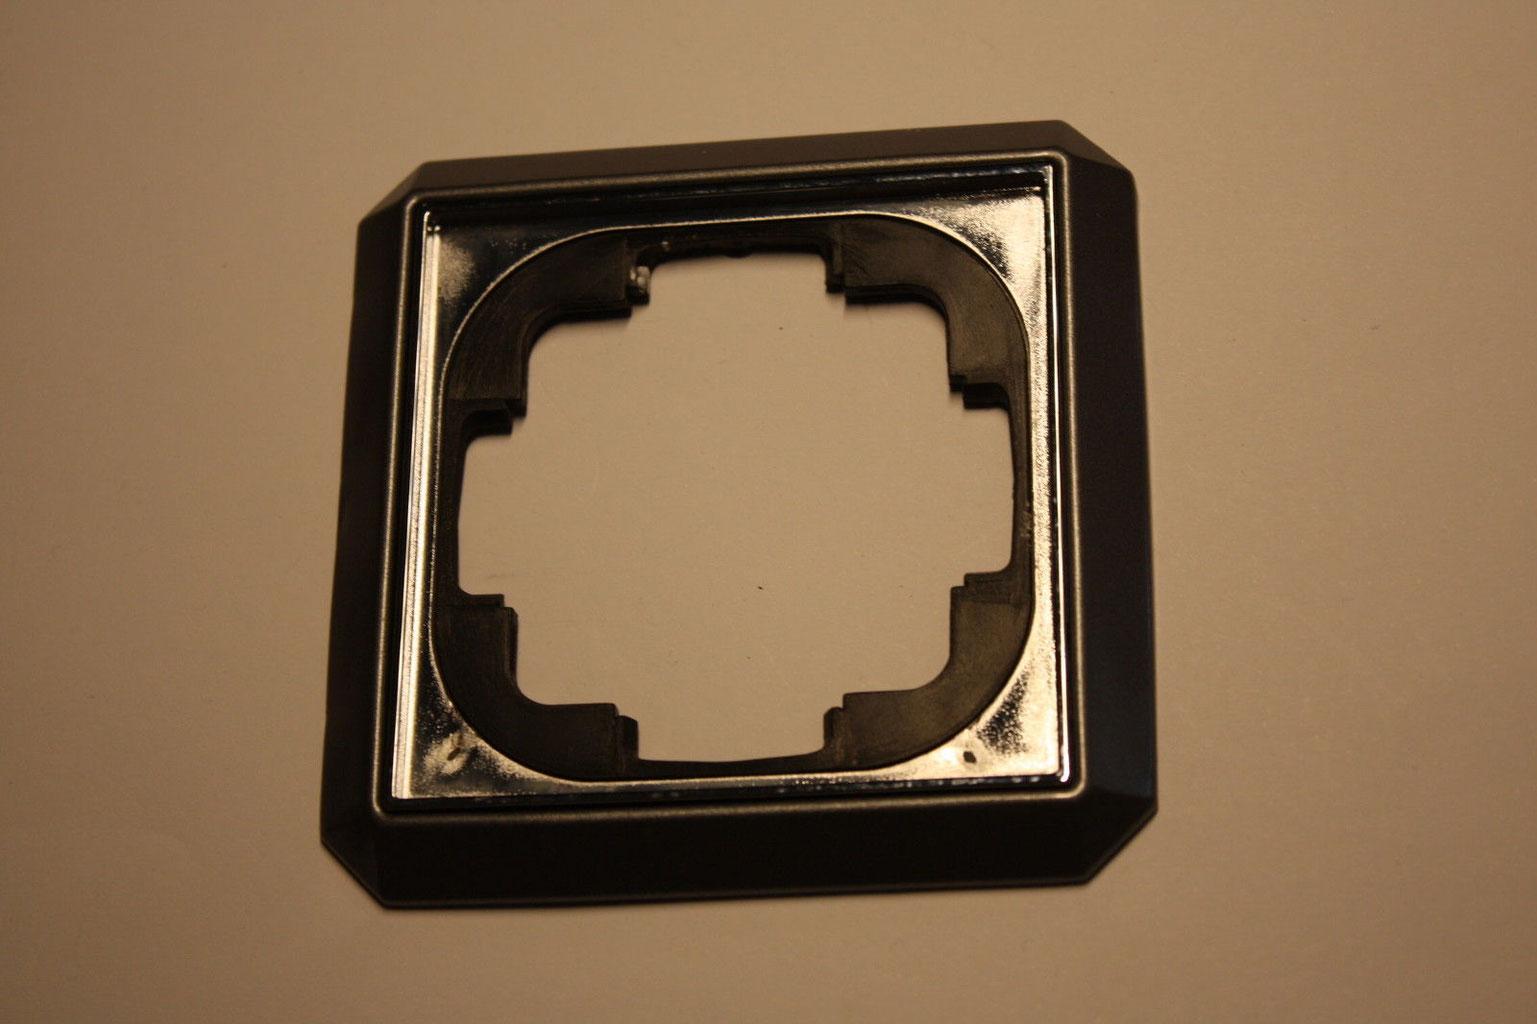 trias facet der shop f r gebrauchtes schaltermaterial. Black Bedroom Furniture Sets. Home Design Ideas